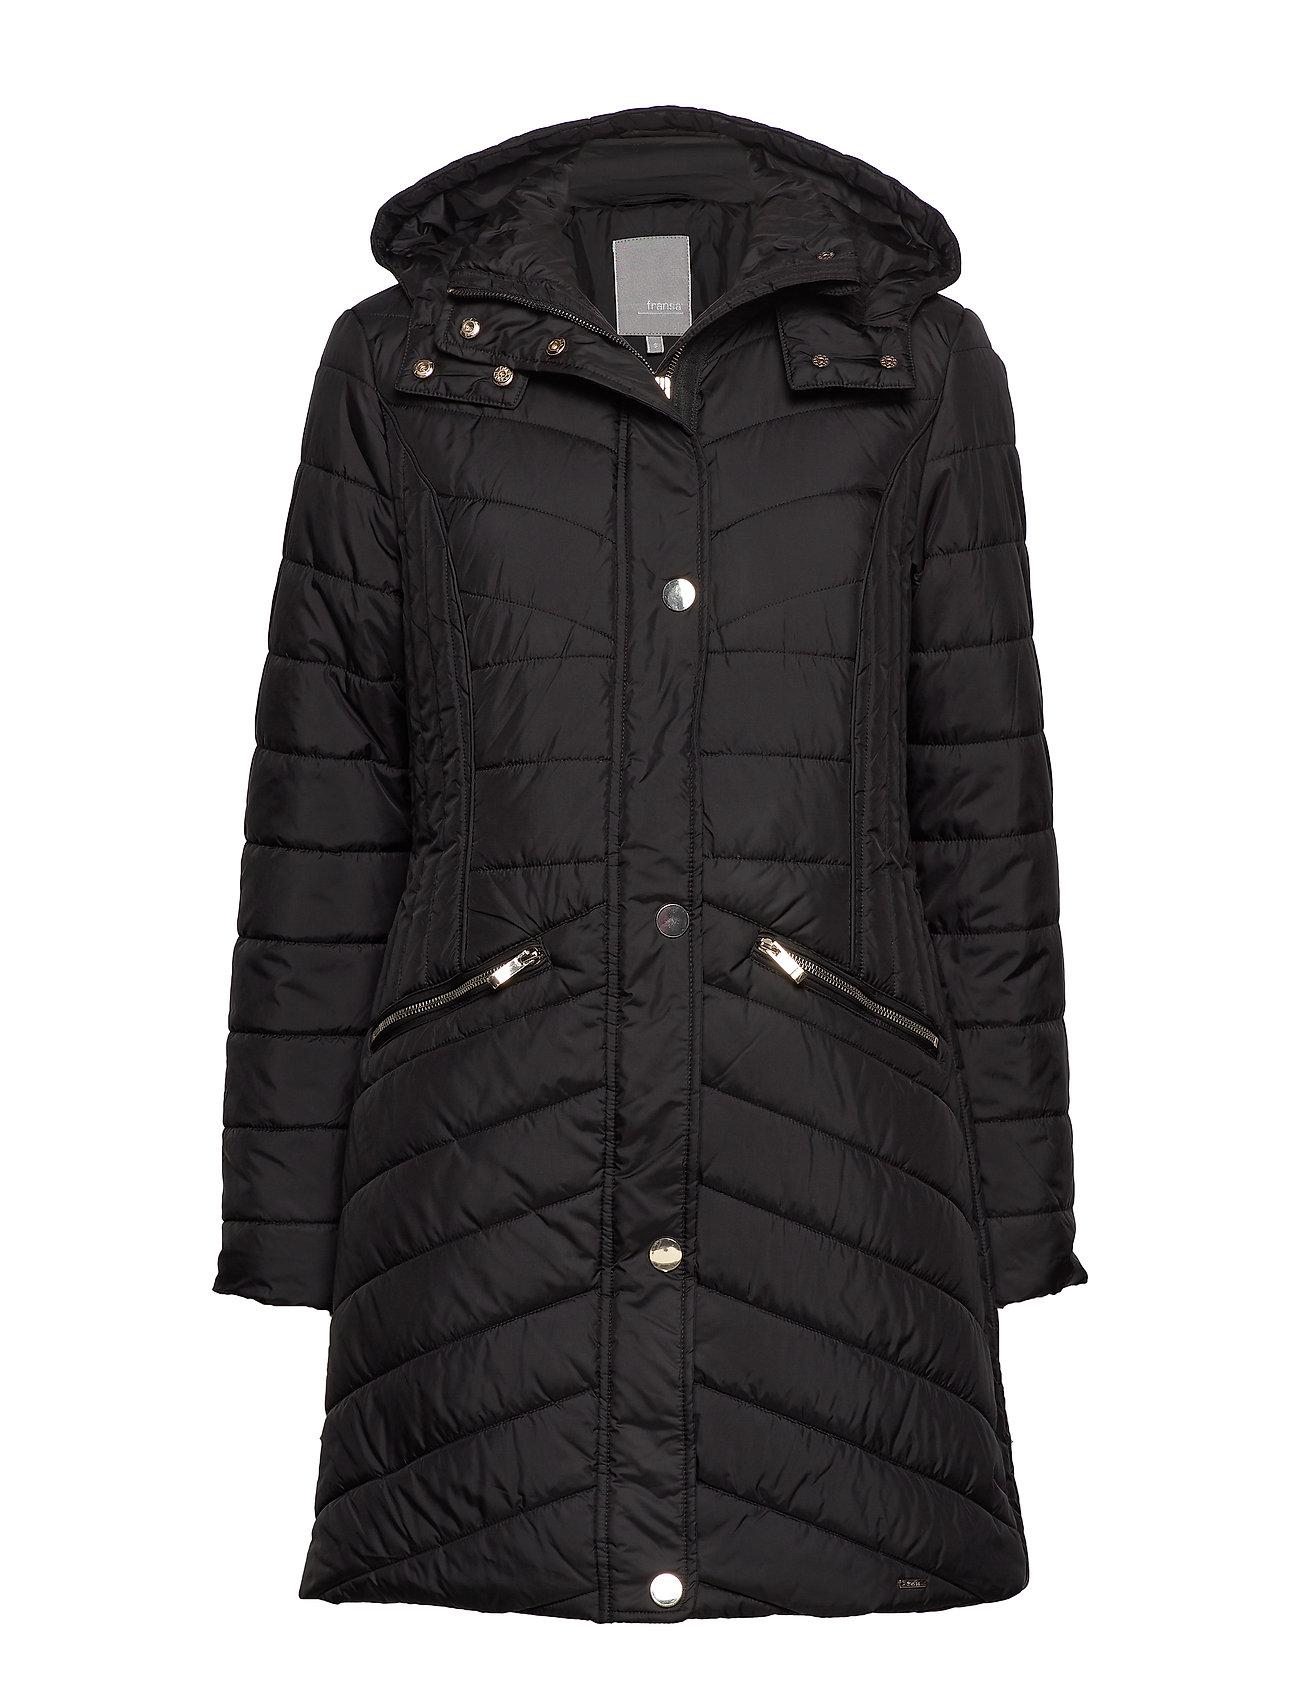 Fransa FRESJACK 2 Outerwear - BLACK